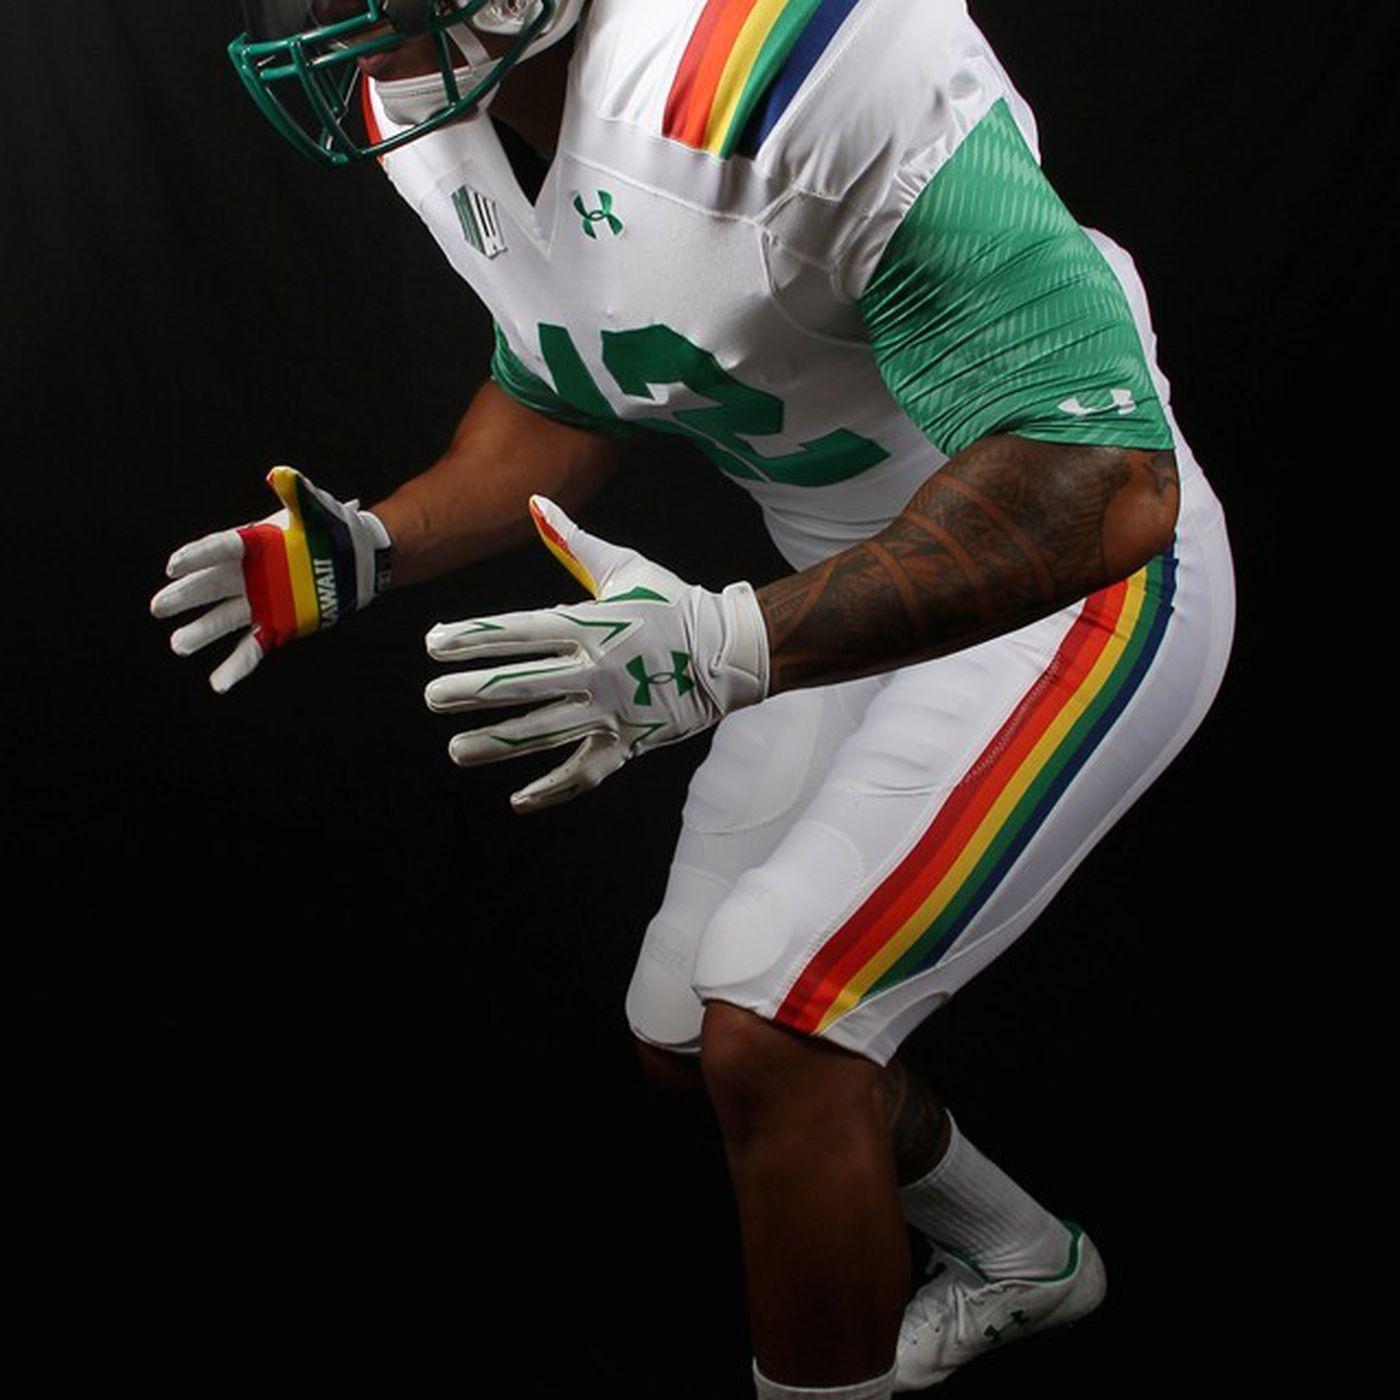 online retailer 5953e f1a44 Hawaii to wear amazing RAINBOW throwback uniforms vs. Ohio ...